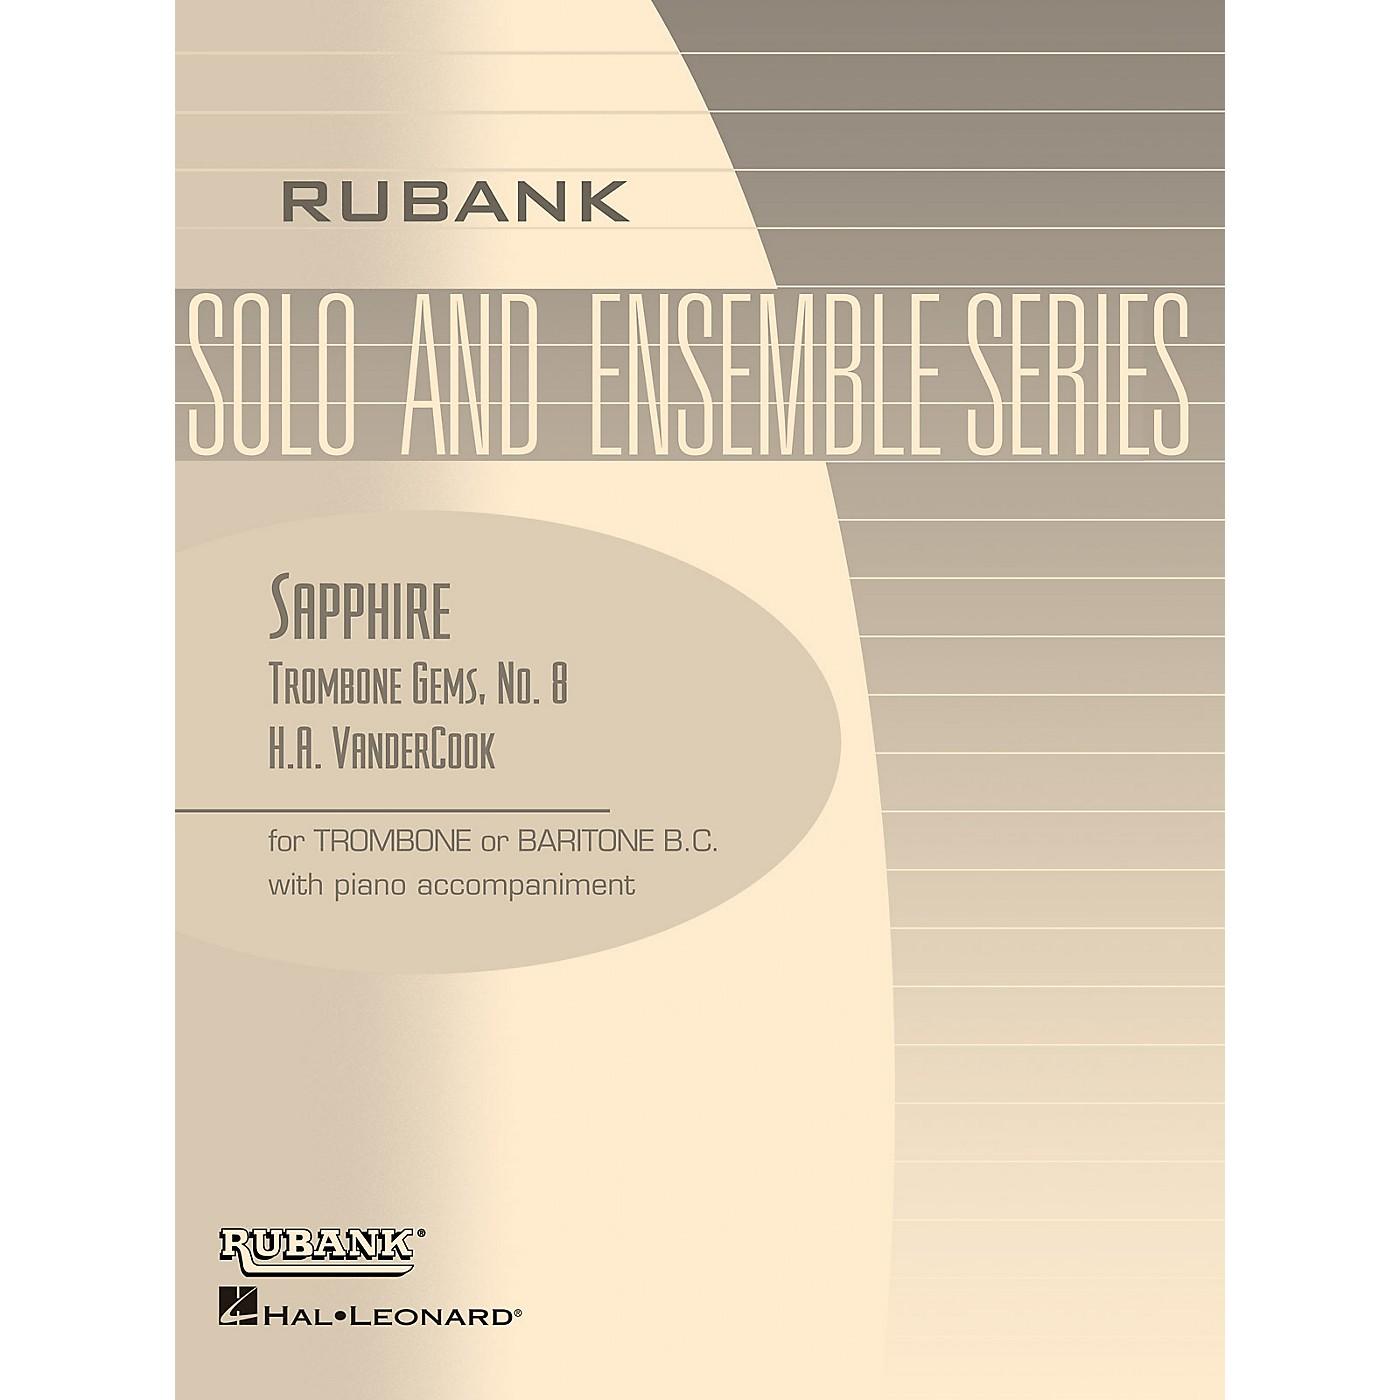 Rubank Publications Sapphire (Trombone (Baritone B.C.) Solo with Piano - Grade 3) Rubank Solo/Ensemble Sheet Series thumbnail